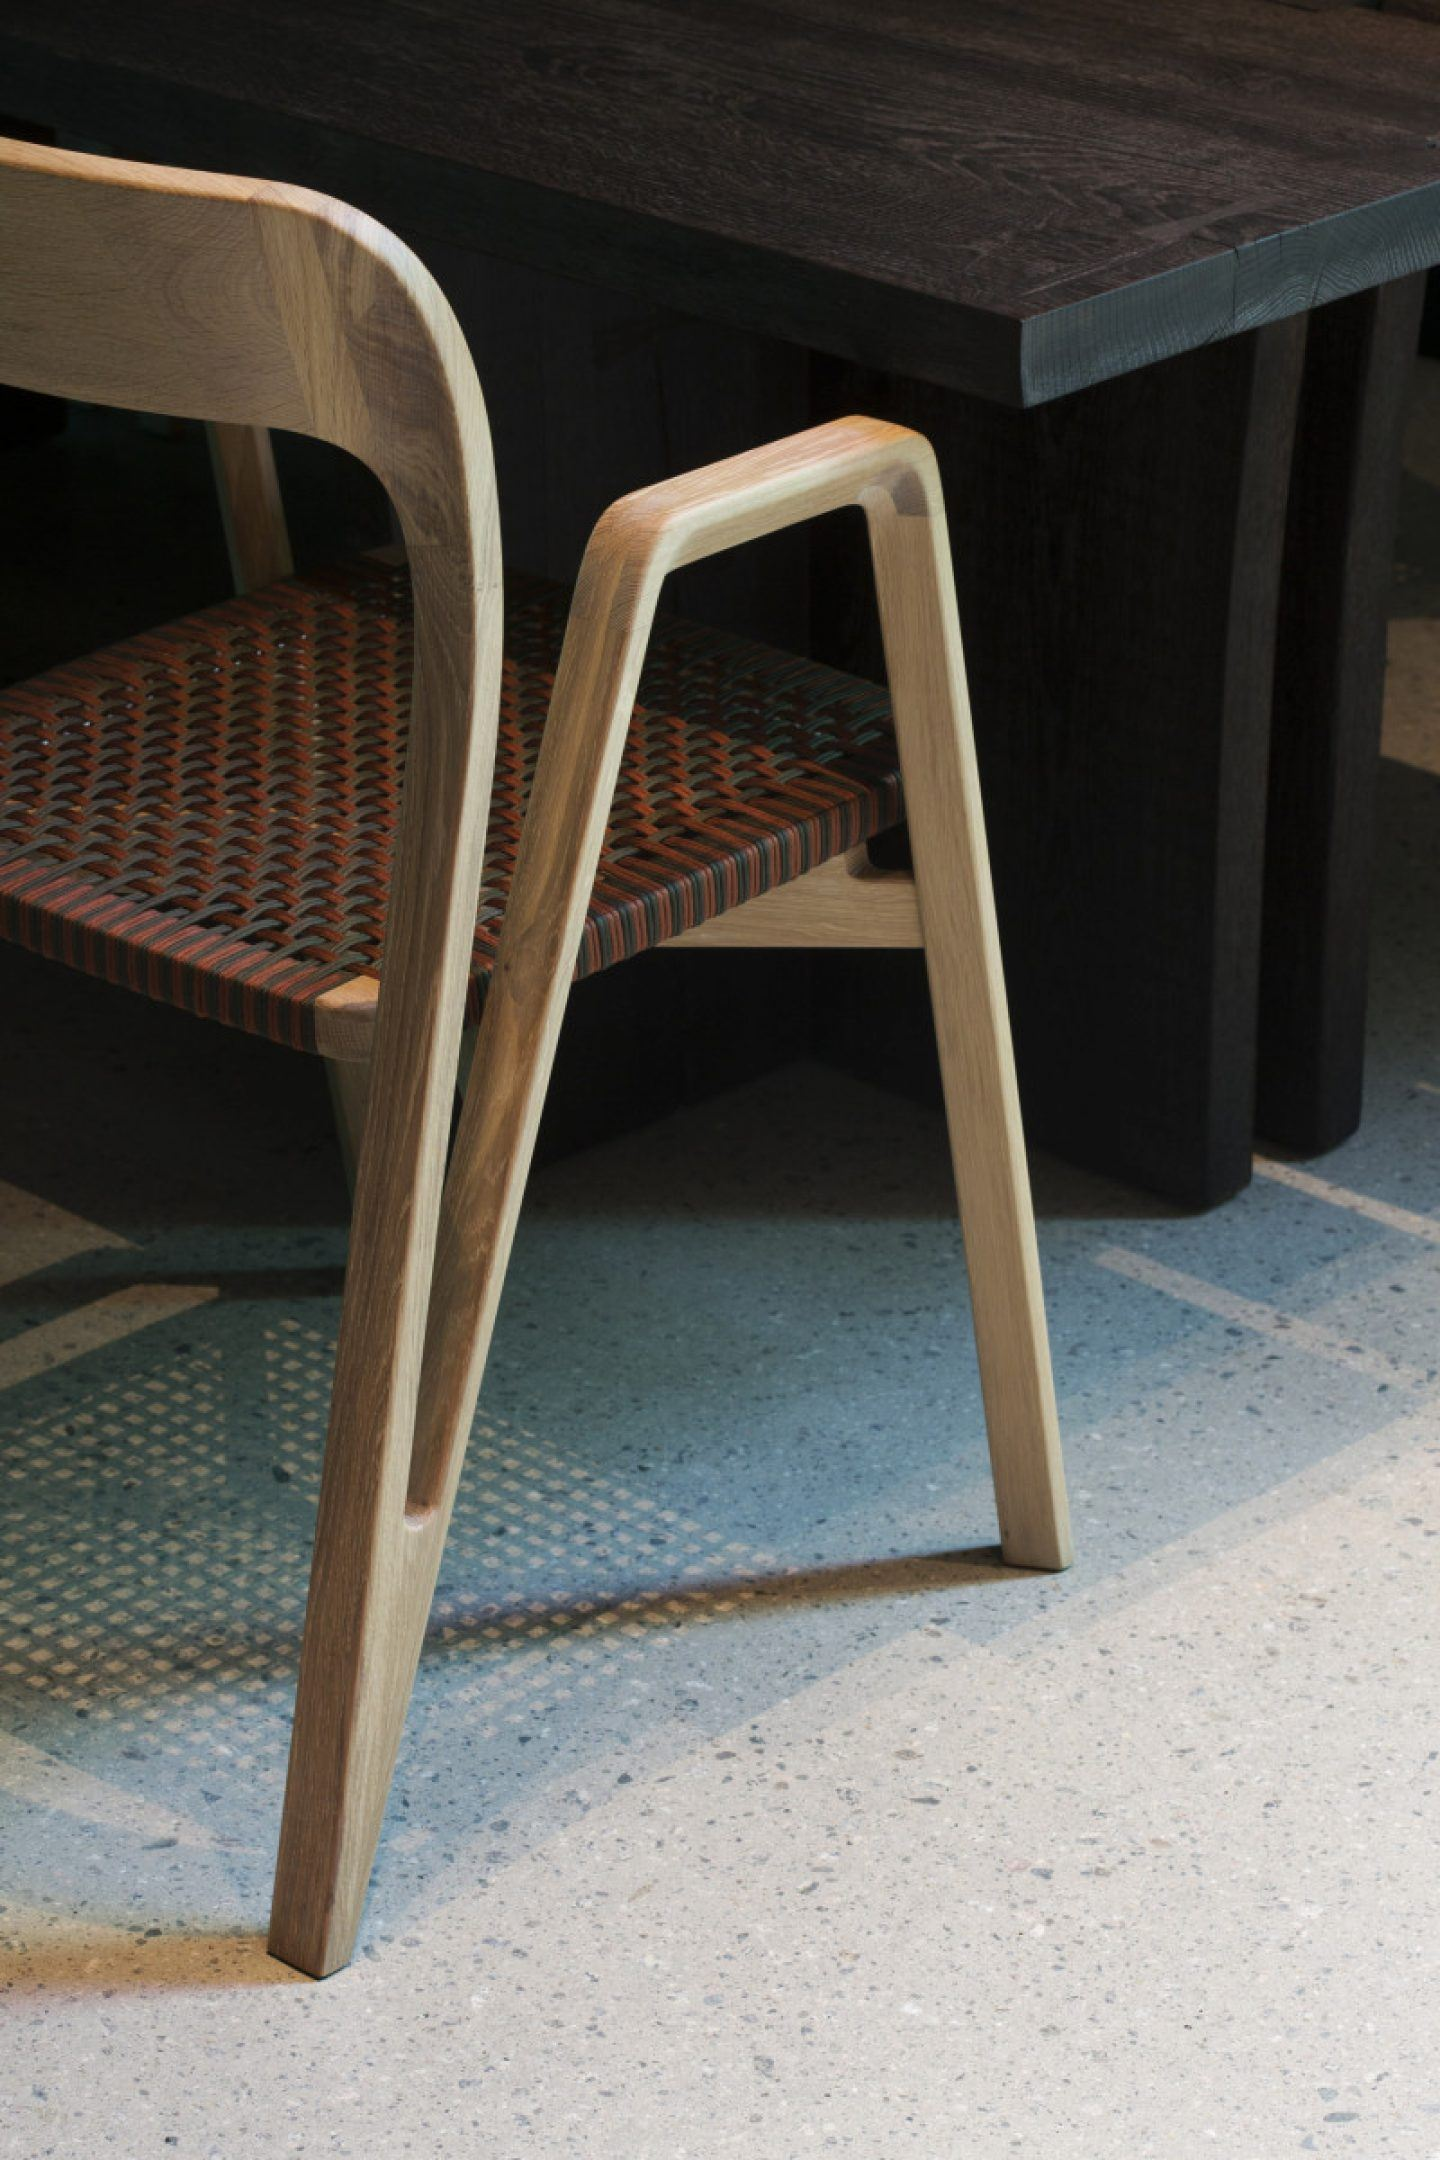 ignant-architecture-snohetta-under-restaurant-100